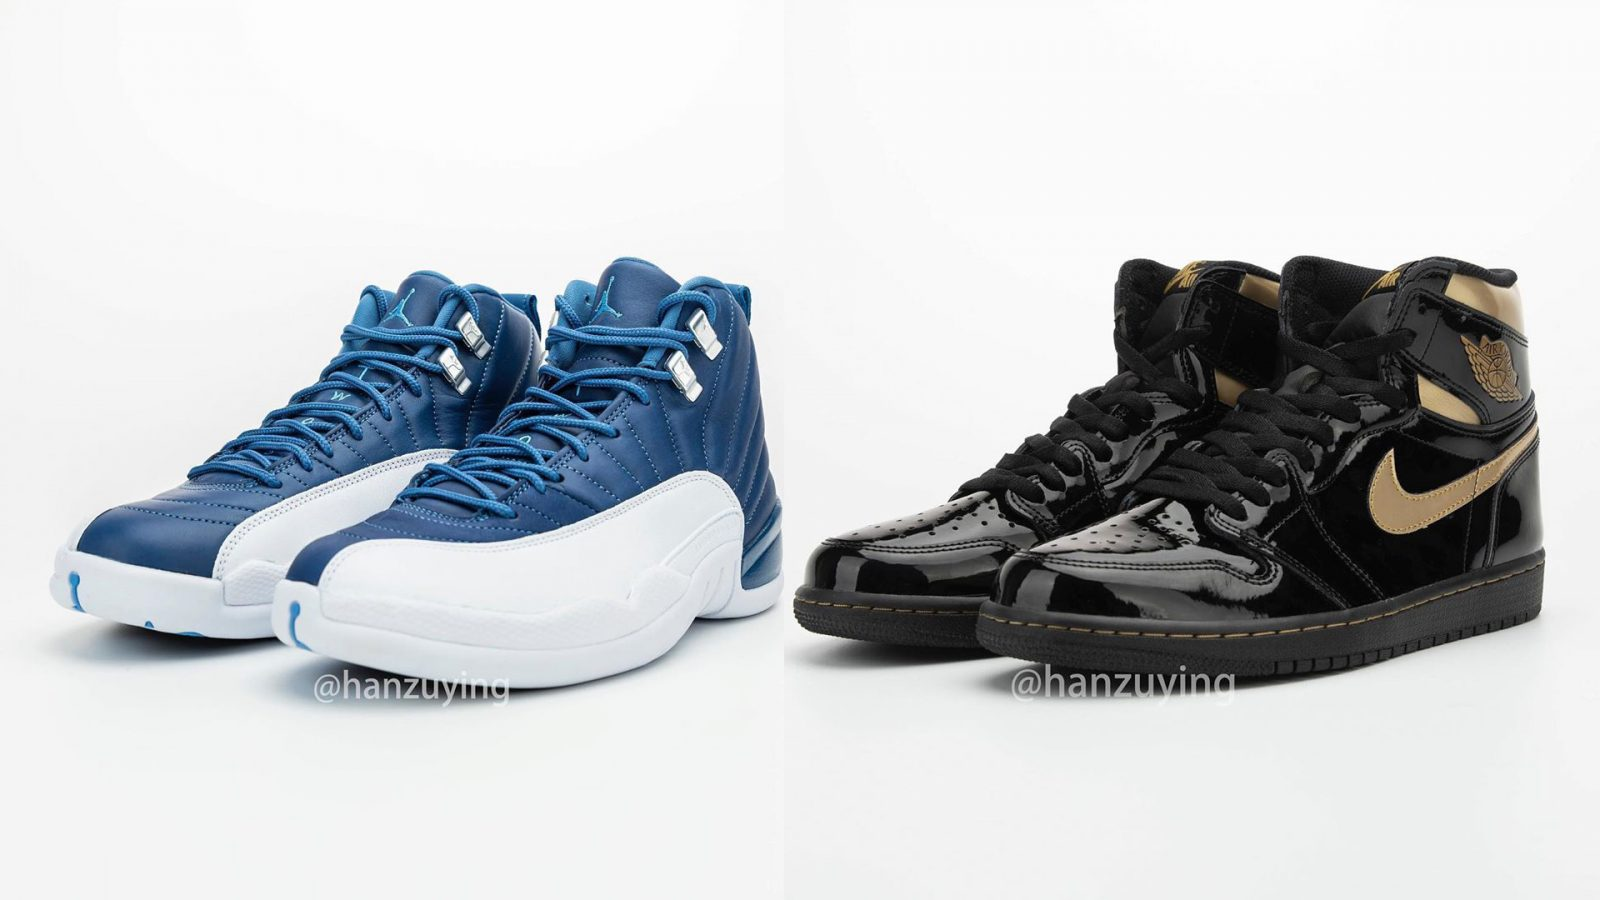 10 Upcoming Air Jordans You Should be